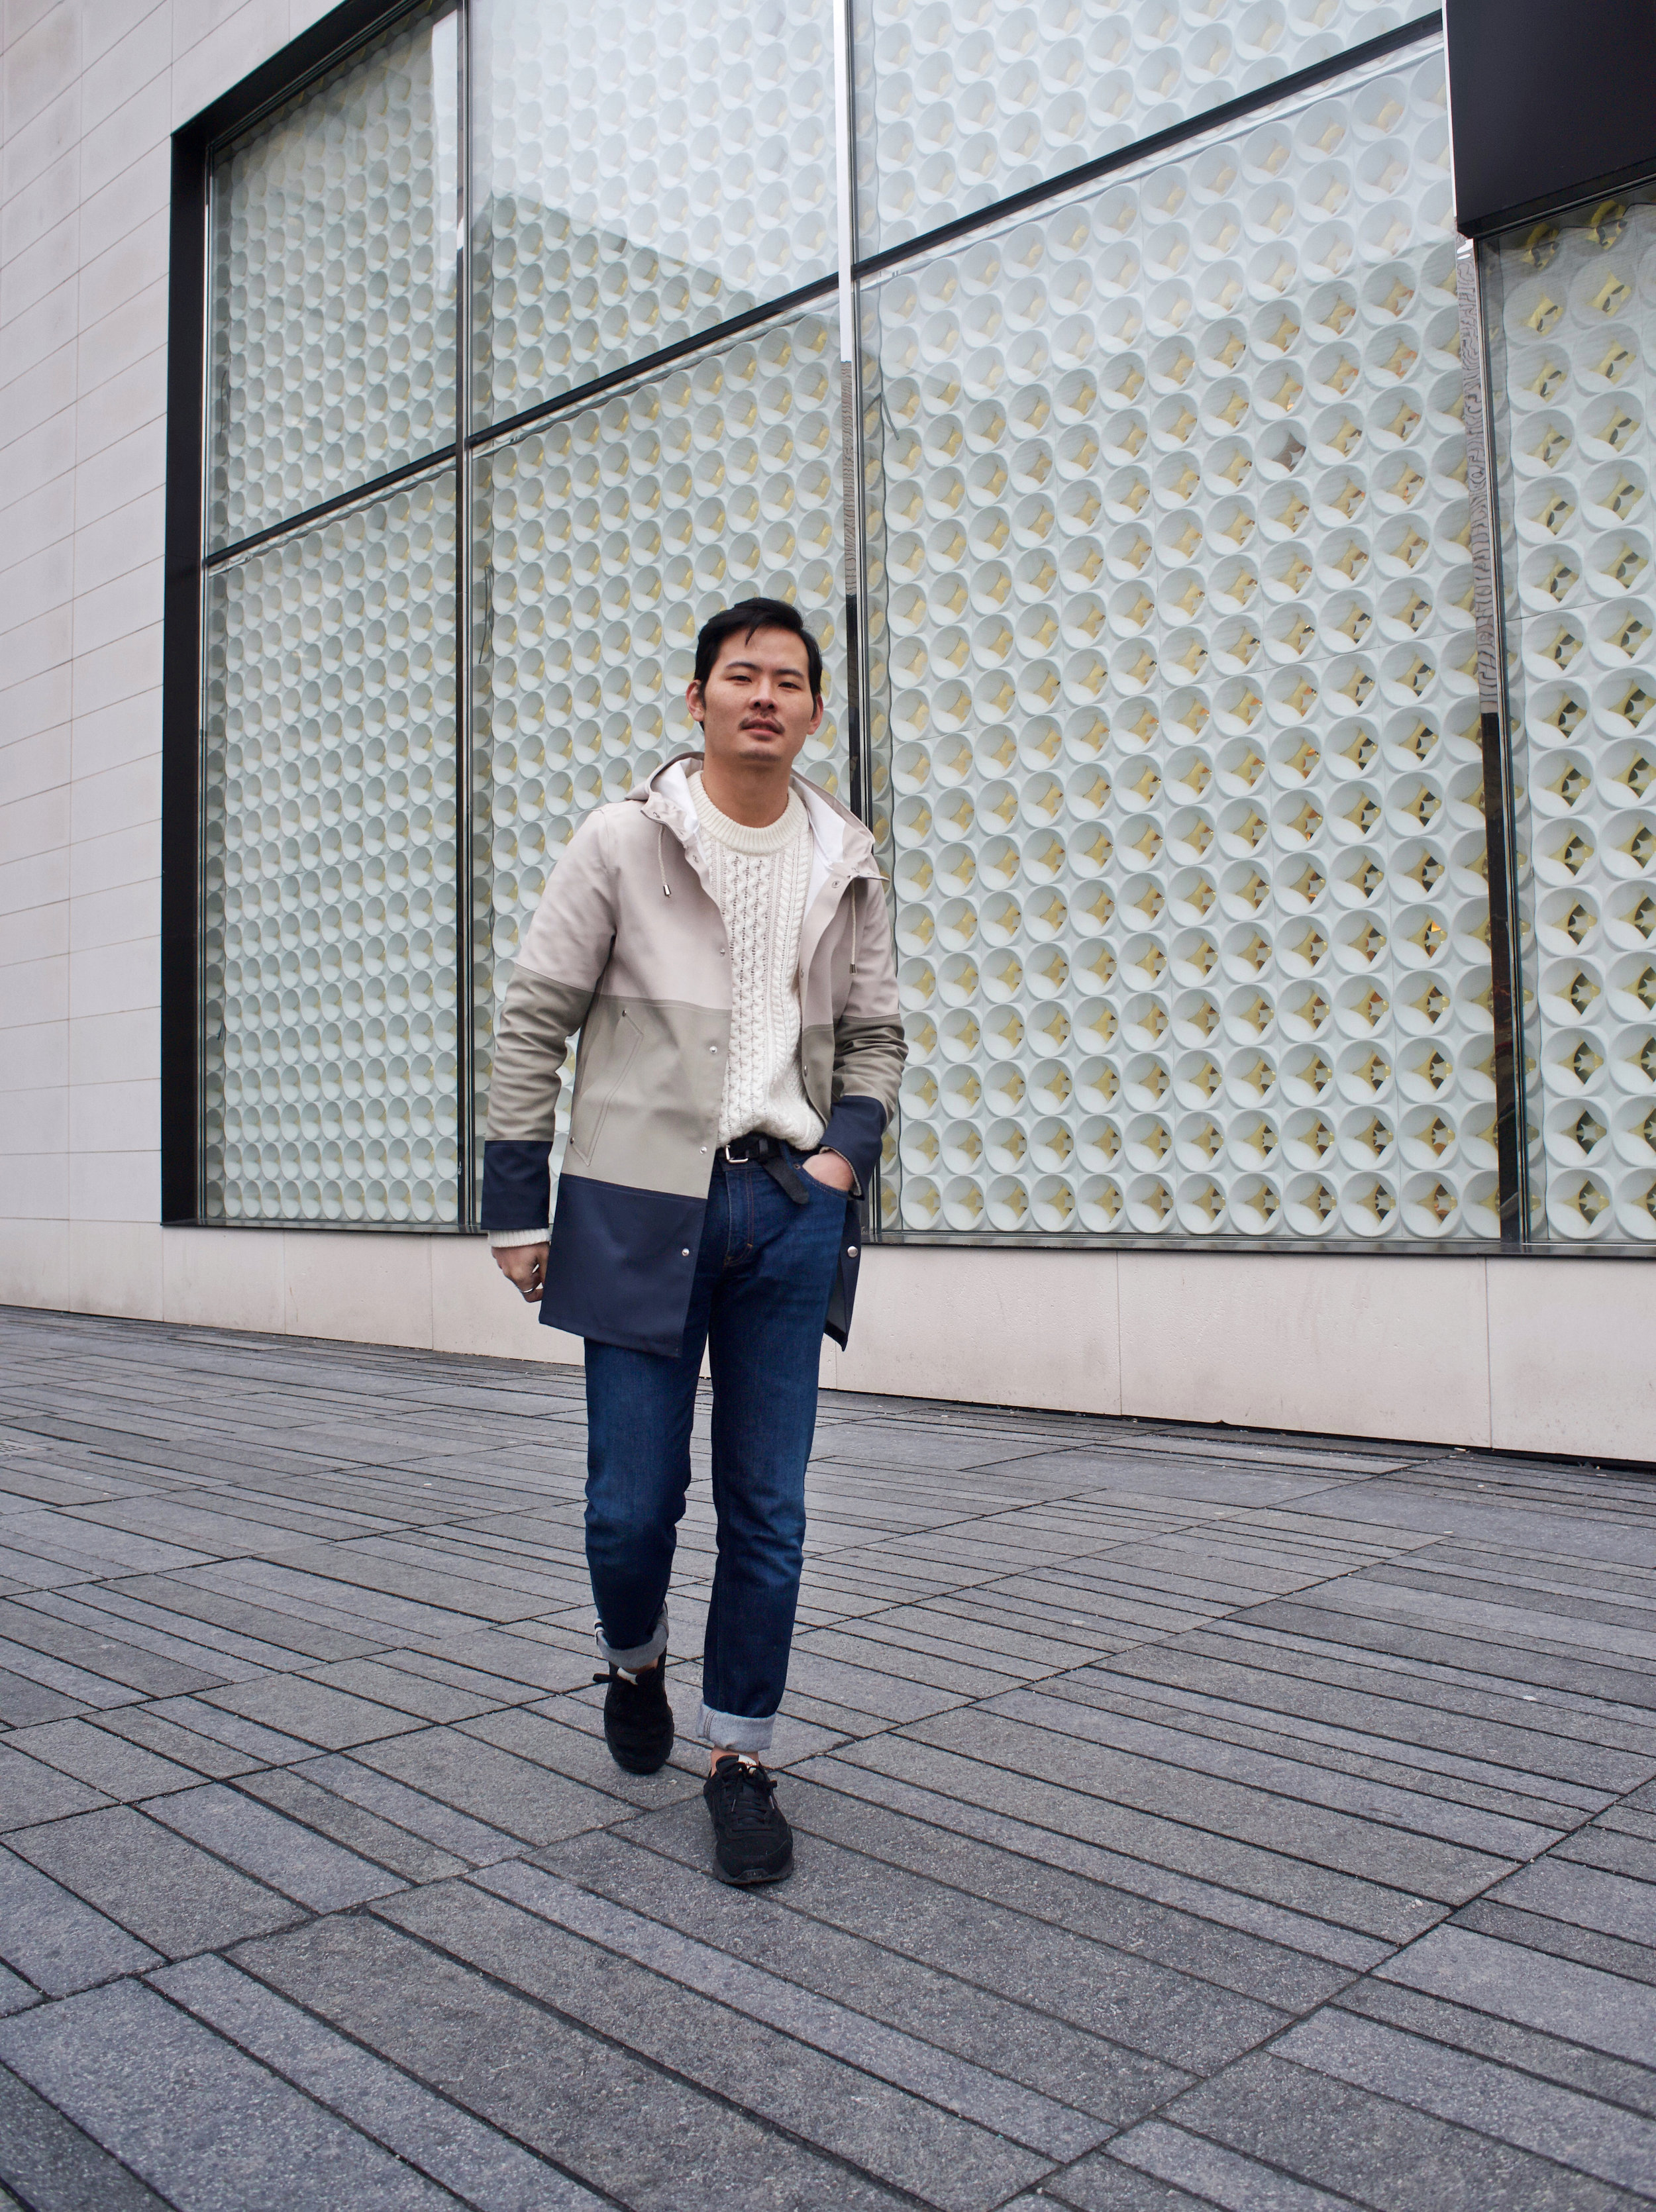 stutterheim raincoat acne jeans menswear